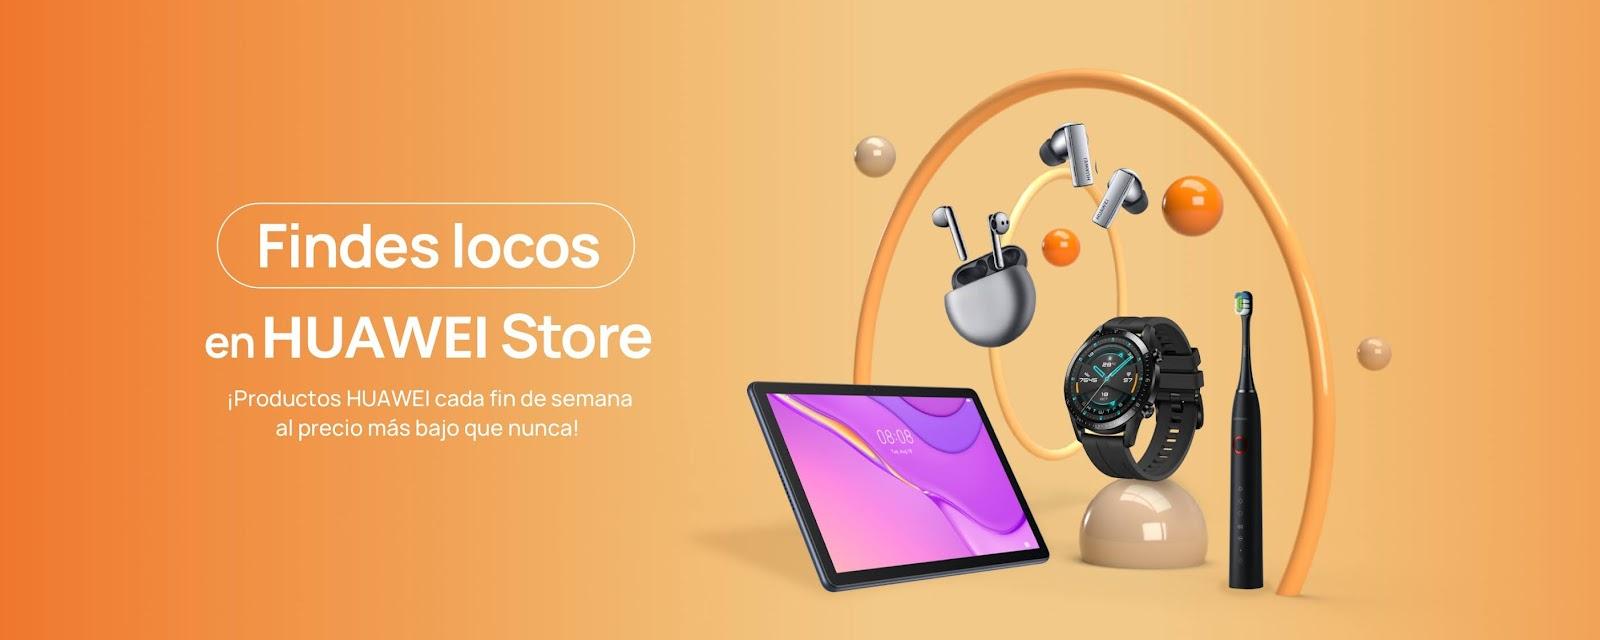 top-5-ofertas-findes-locos-27-29-agosto-huawei-store